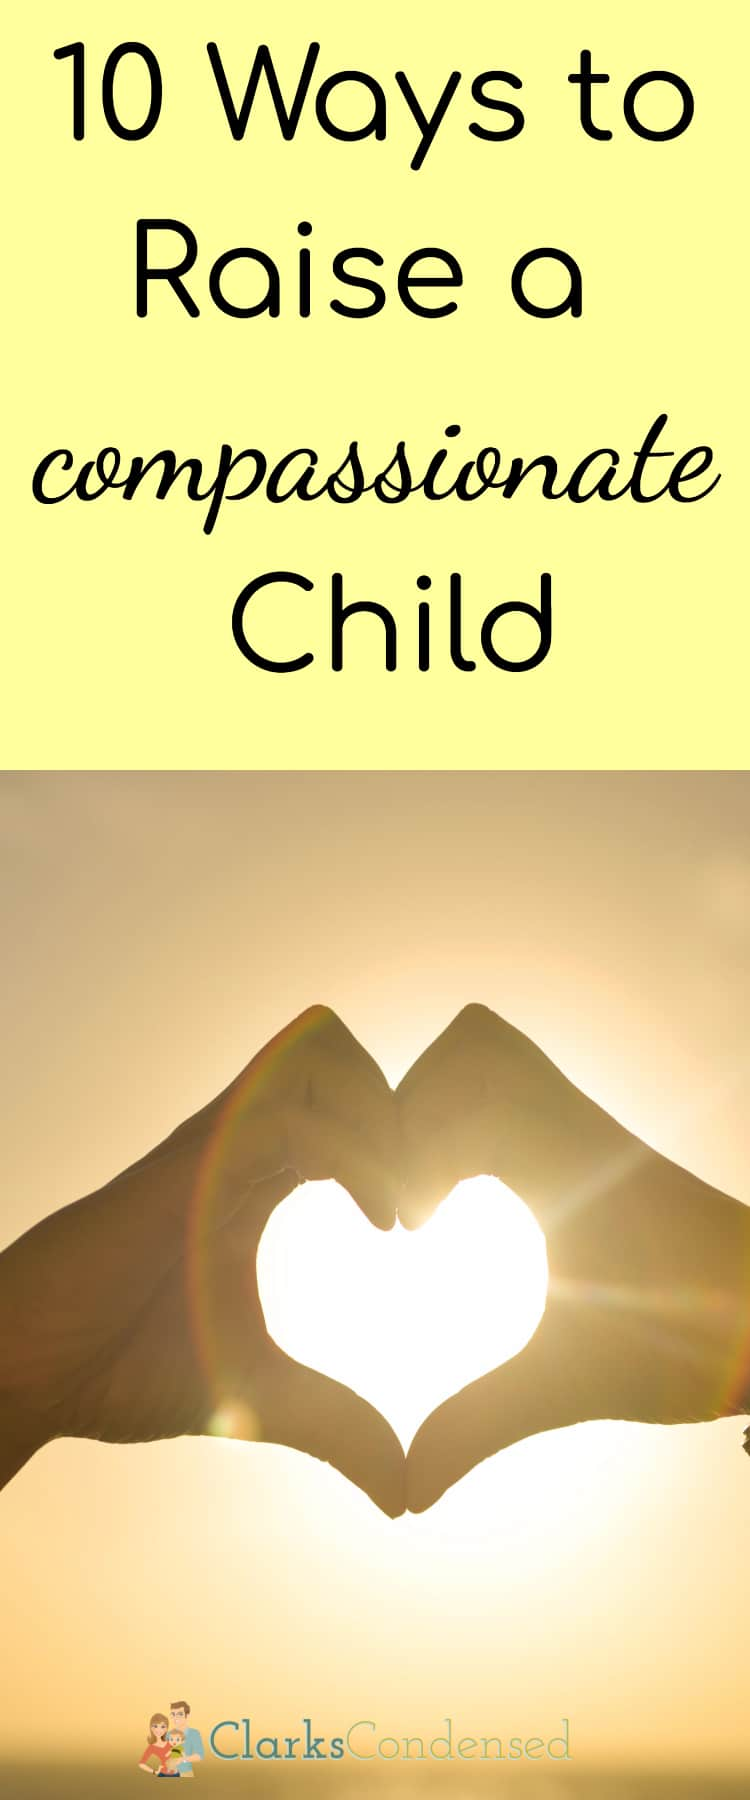 10 Ways to Raise a Compassionate Child / Compassion / Parenting / School via @clarkscondensed